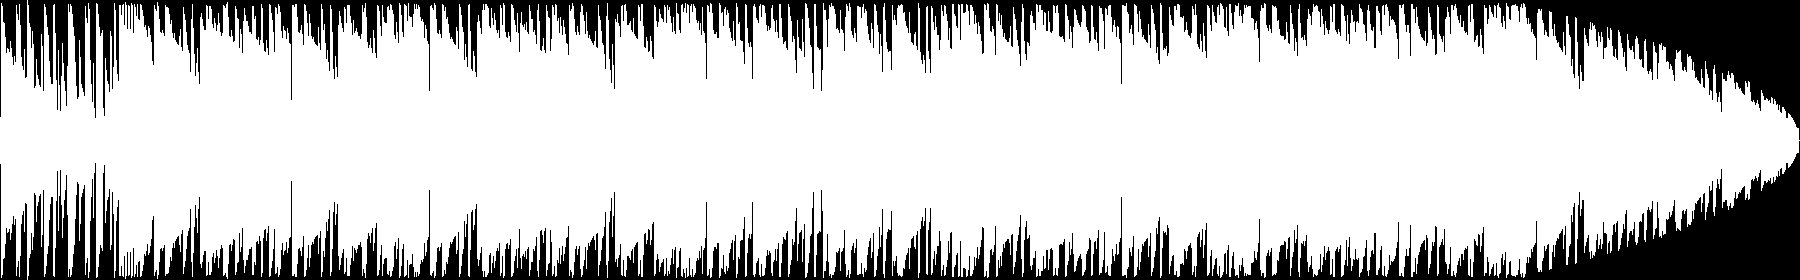 8-Bit Sauce audio waveform